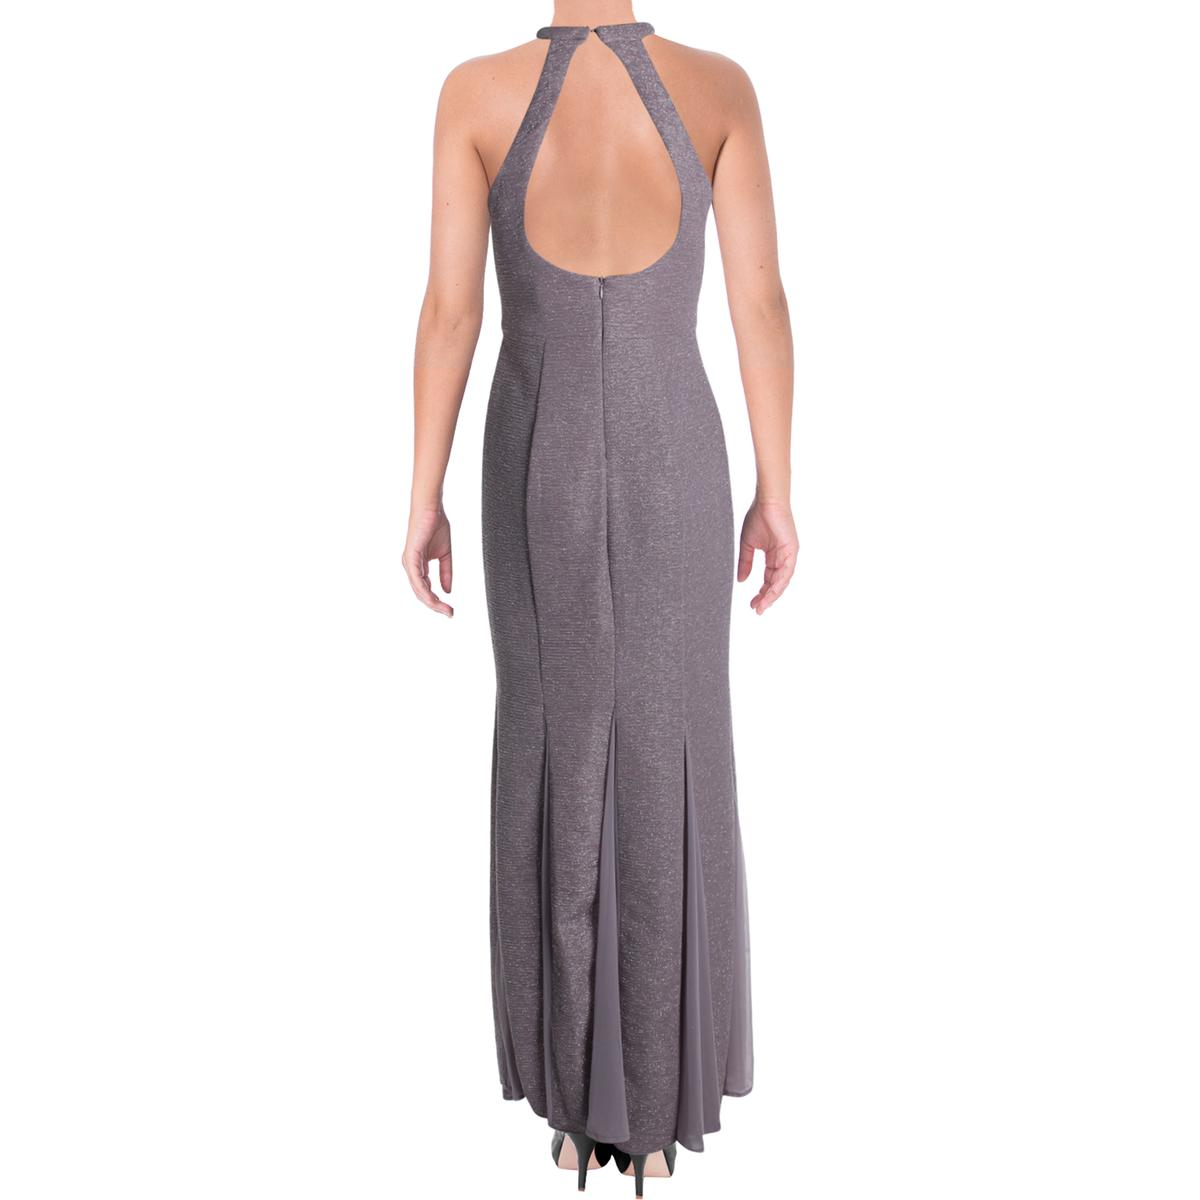 Faviana Womens Prom Full-Length Formal Evening Dress Gown BHFO 3349